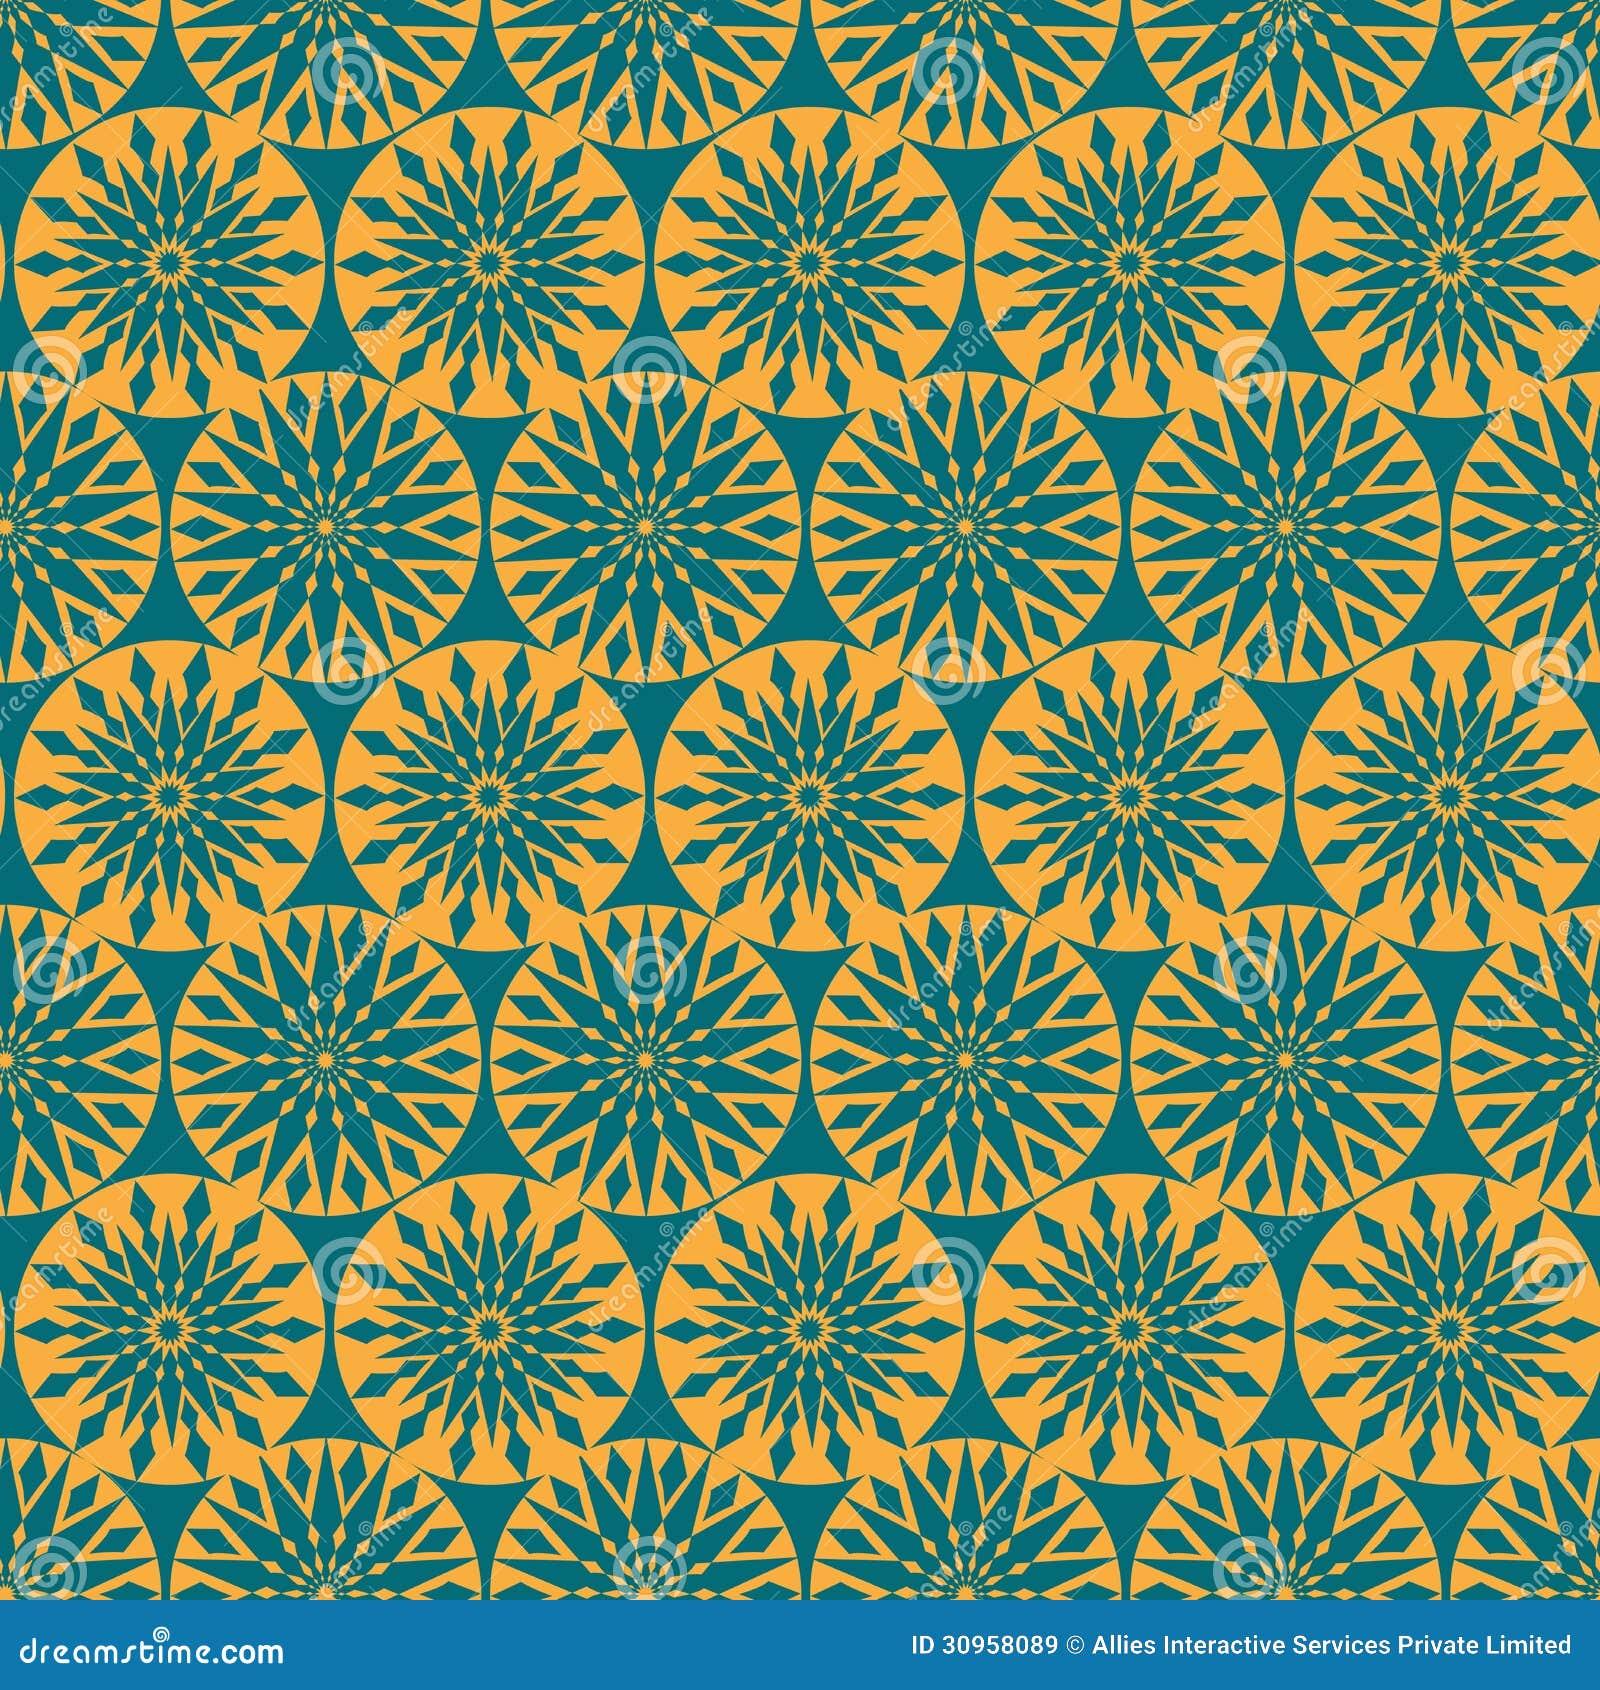 Islamic Geometric Patterns Images Stock Photos amp Vectors